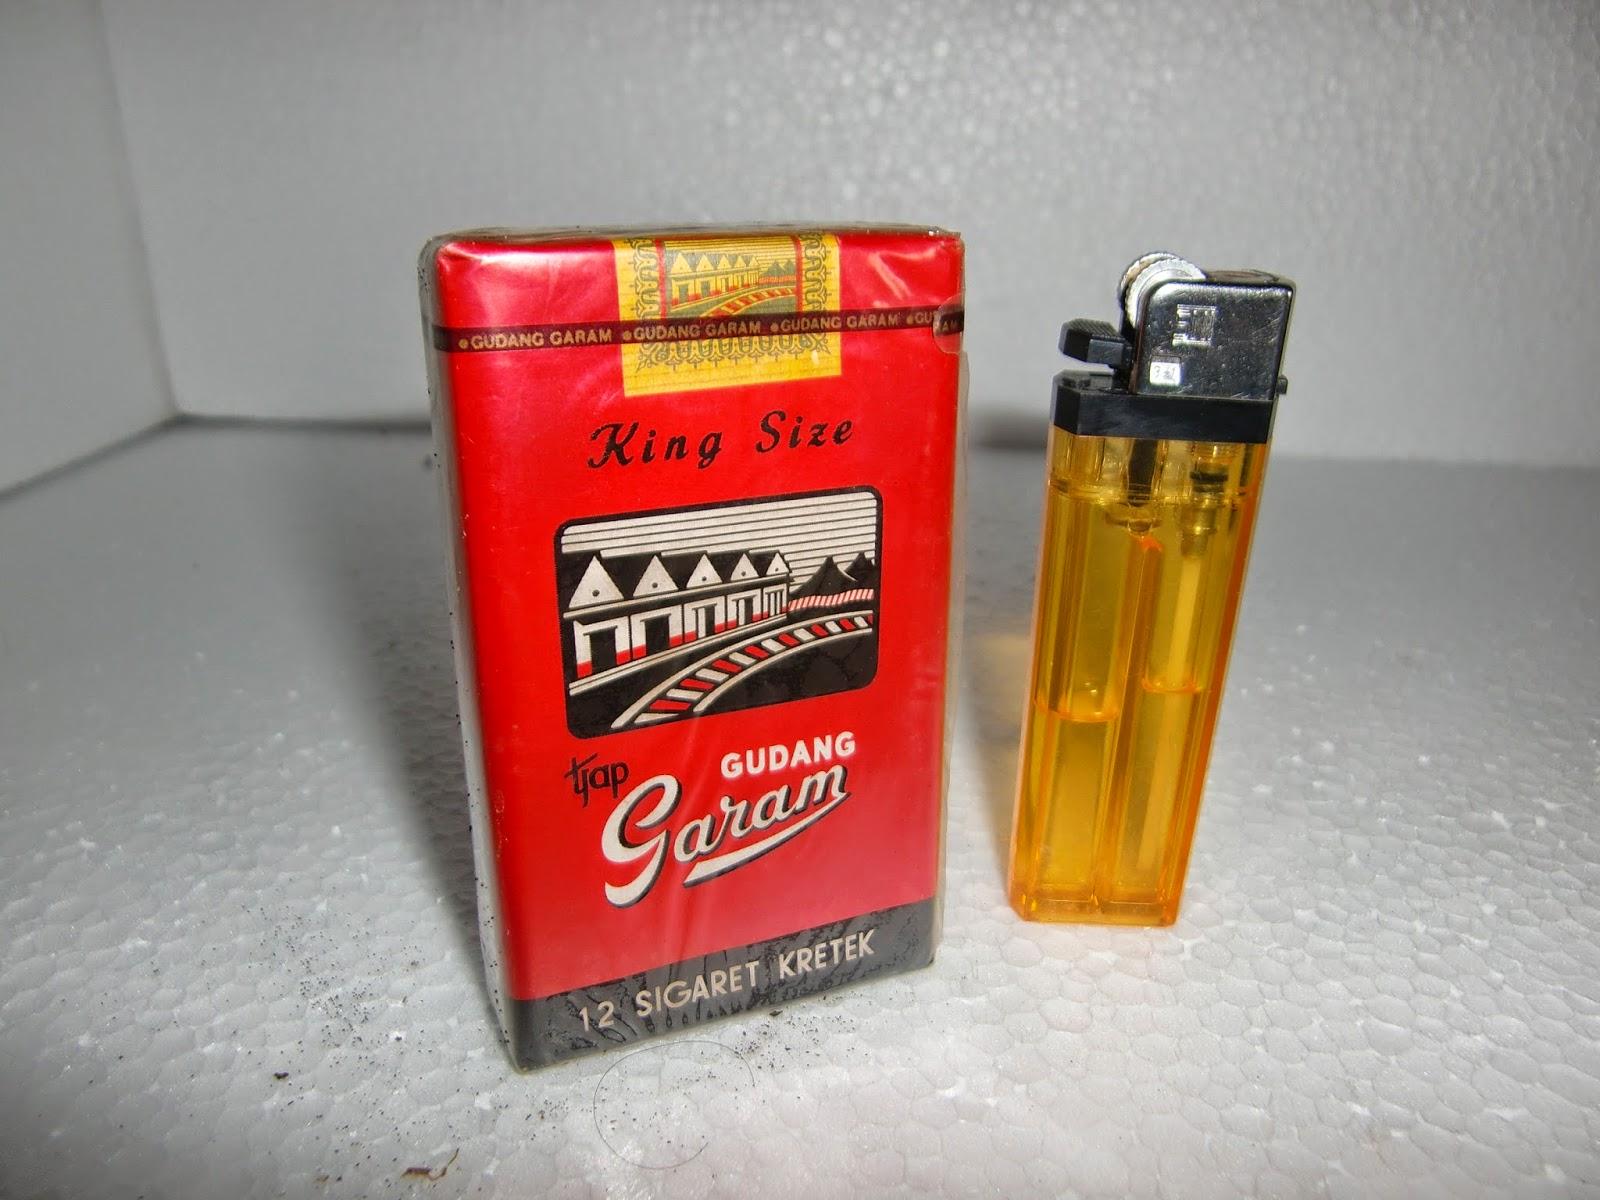 Rokok Gudang Garam Hitam Filter 12 Batang Gp Garpit International Koleksi Merah